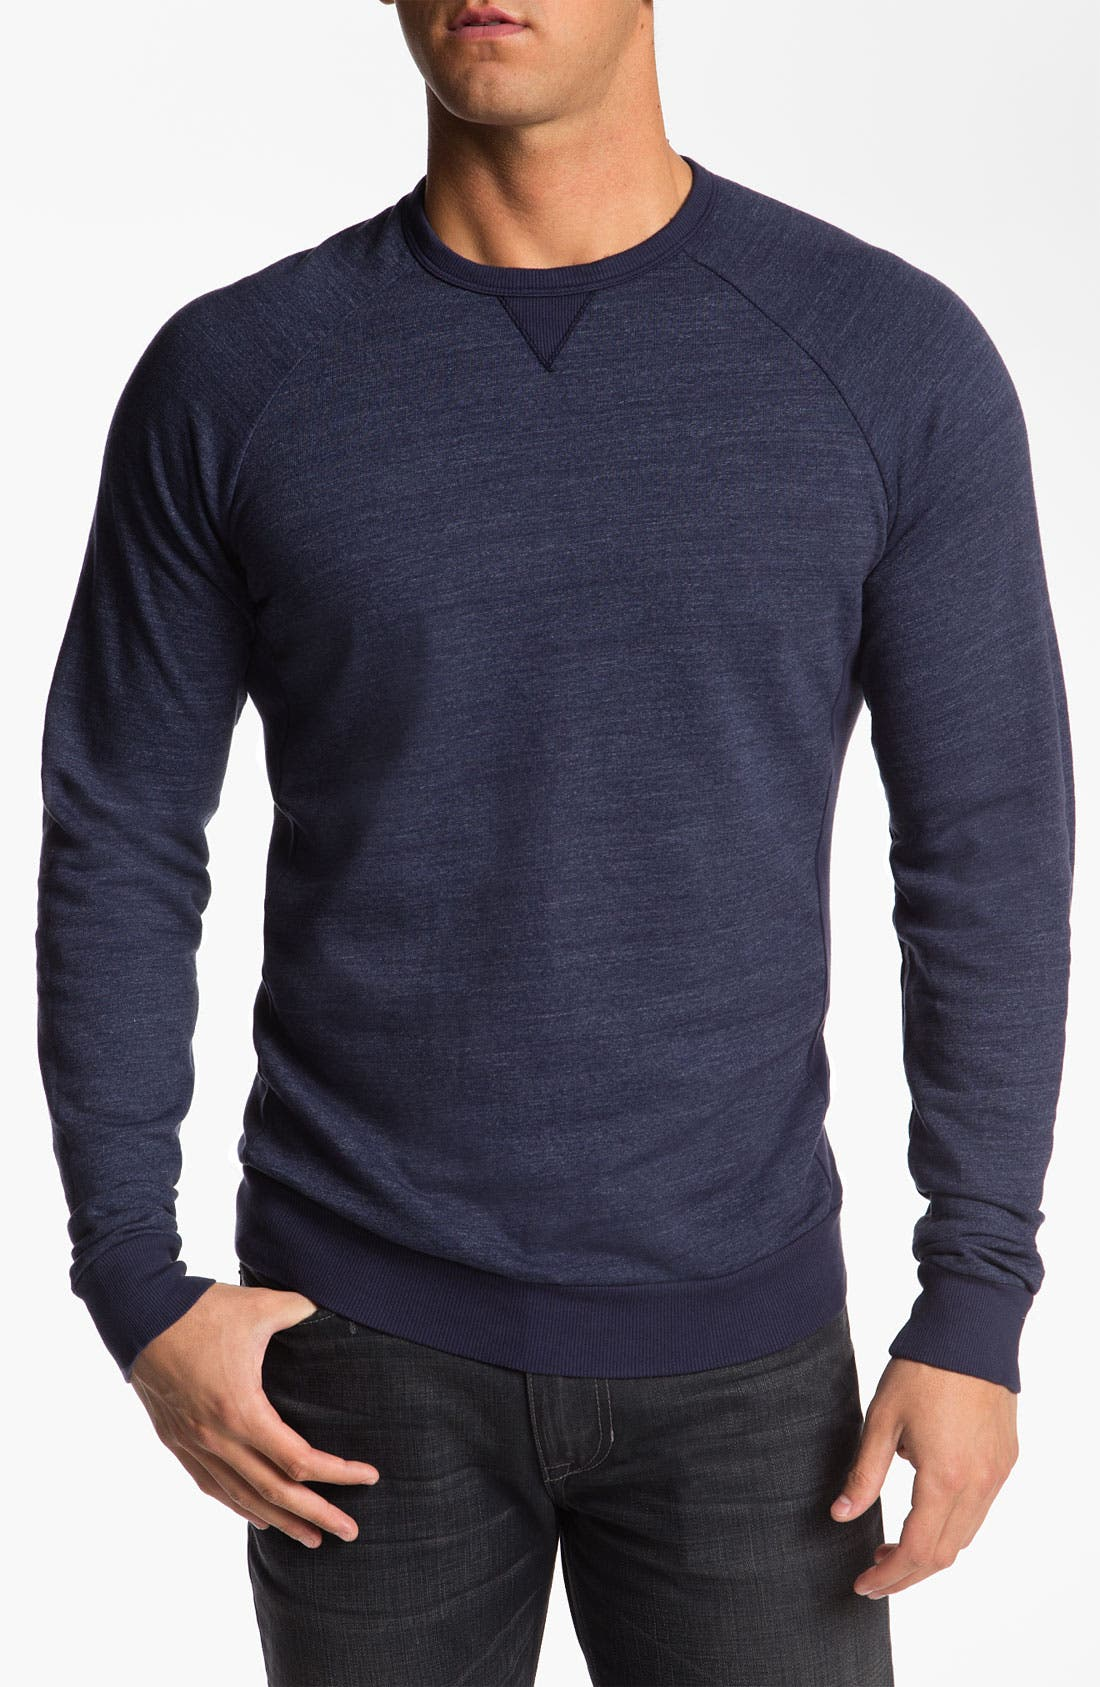 Alternate Image 1 Selected - Splendid Mills 'Brody' Crewneck Sweatshirt